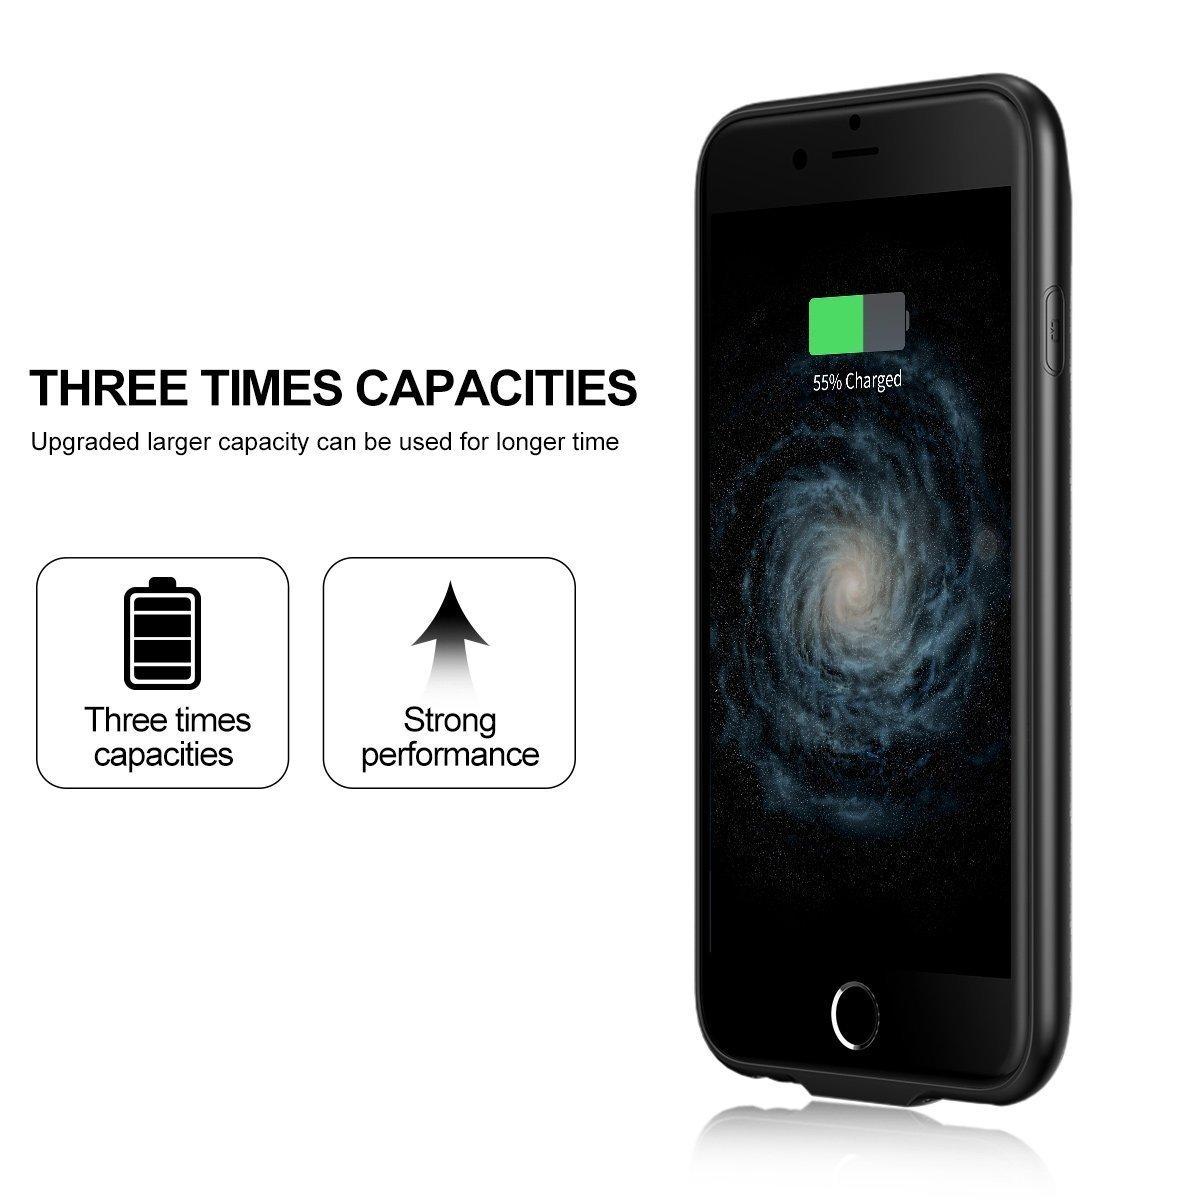 BASEUS เคสแบตสำรอง iPhone7Plus/8Plus 5.5' ความจุสูง7300mAh แบบบางพิเศษ Ultrathin สีดำ